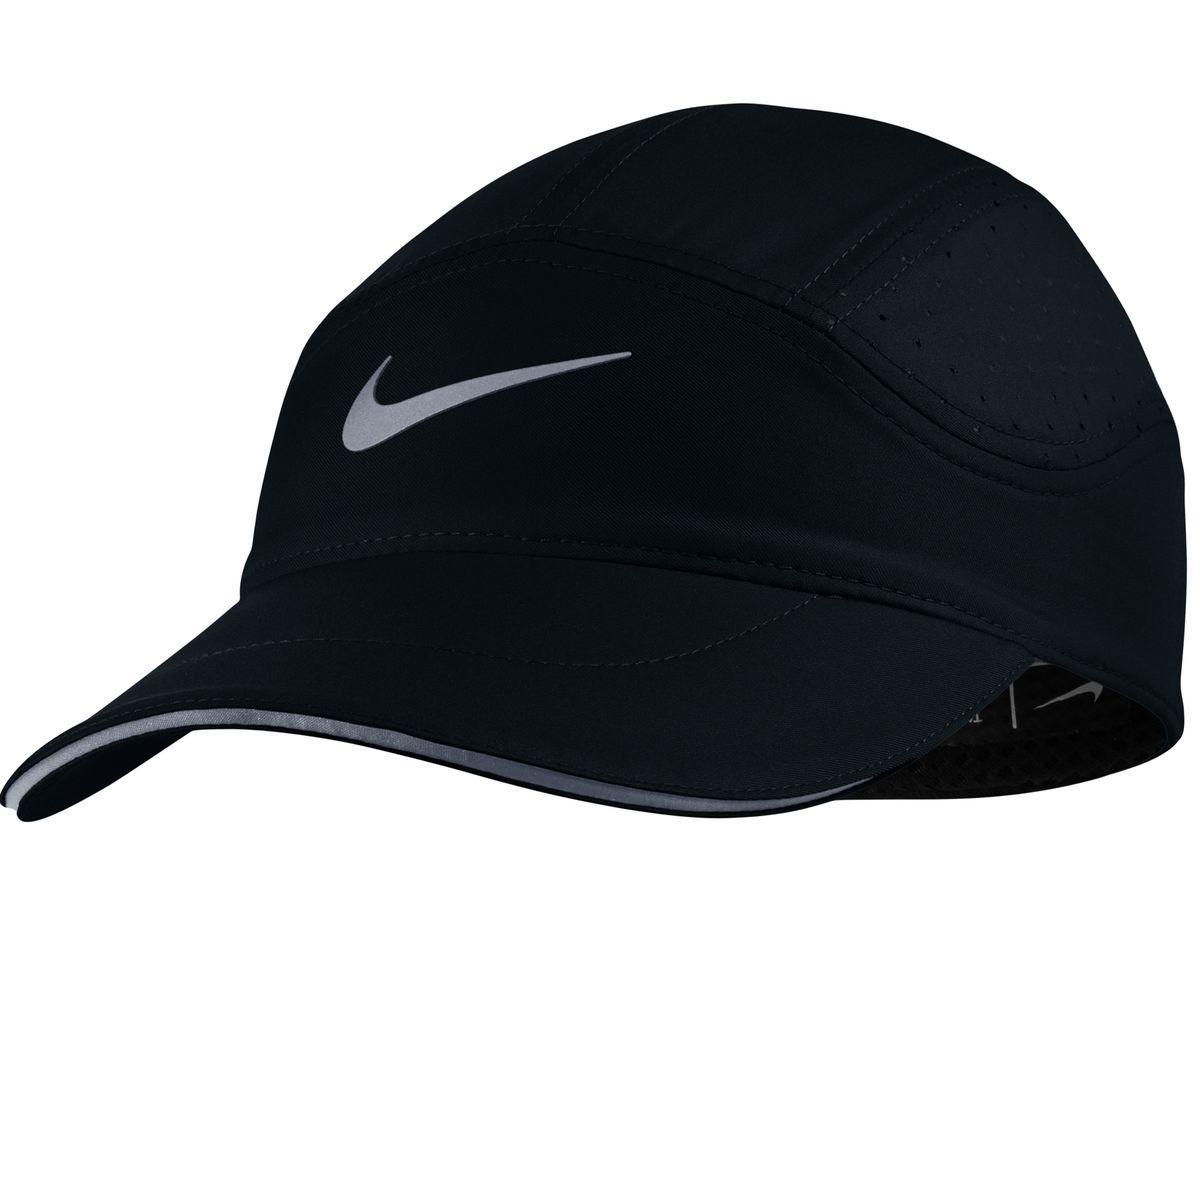 Lyst - Nike Aerobill Elite Running Hat in Black 376059ae36f9